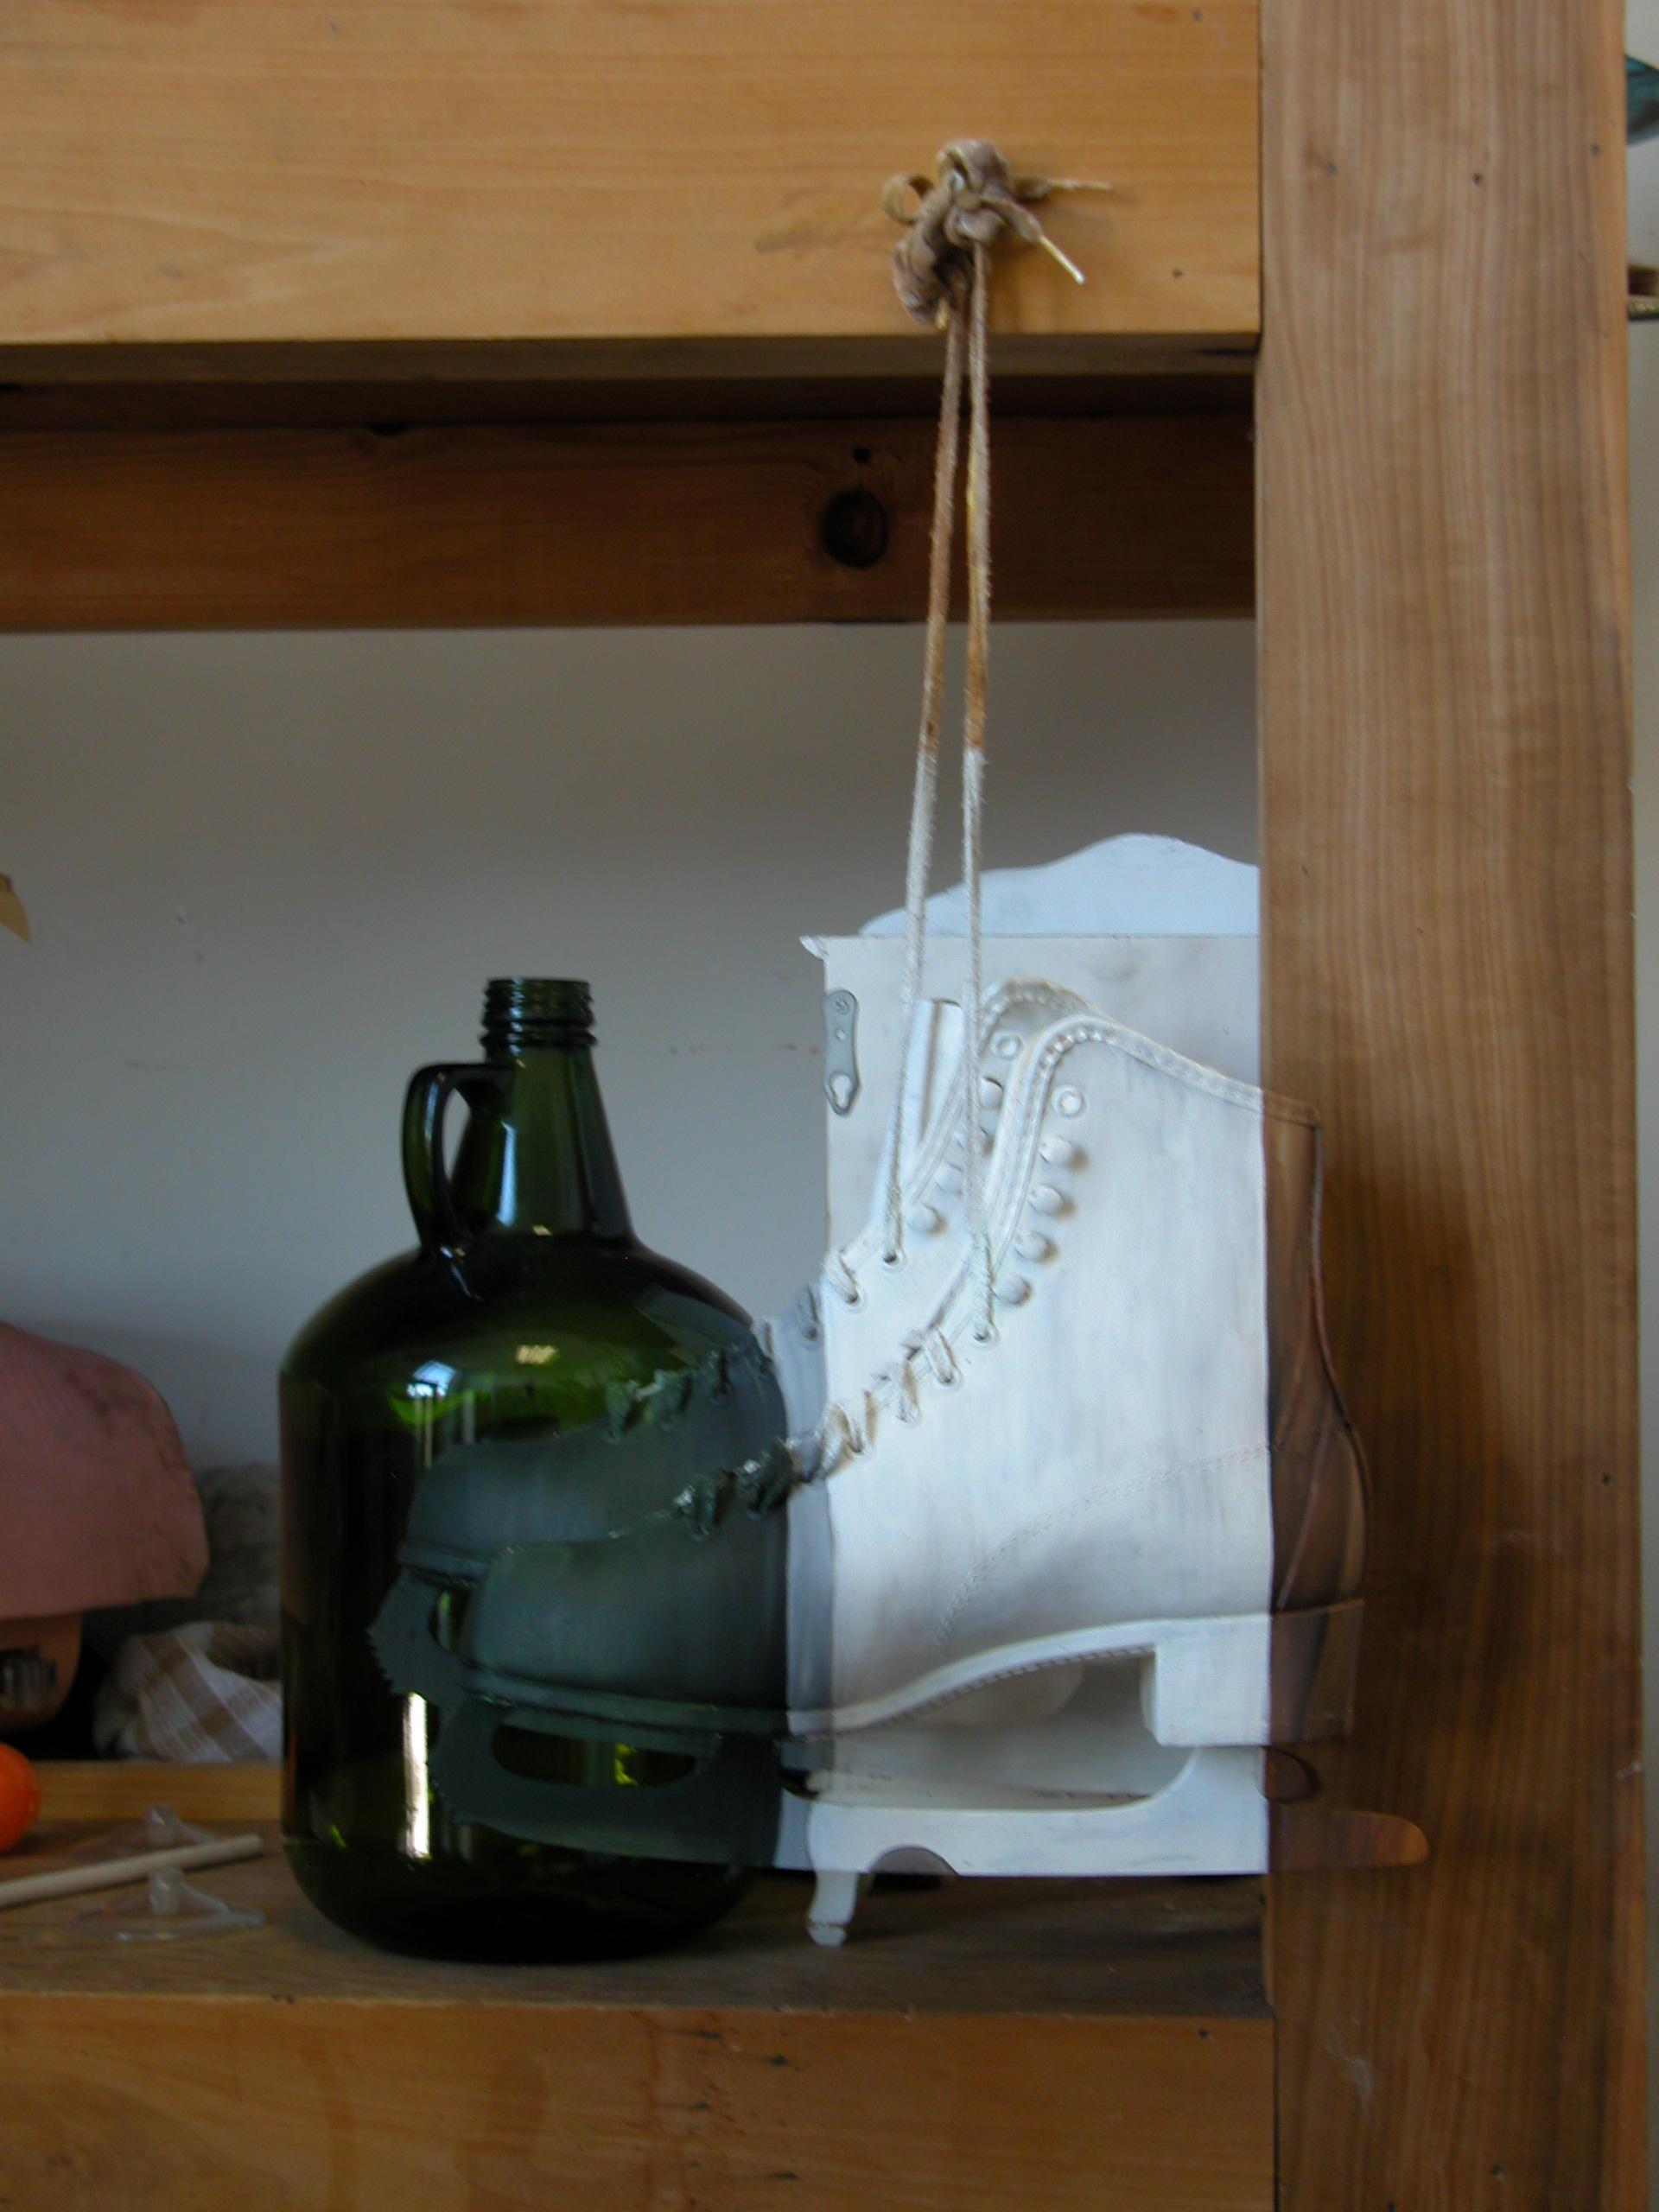 7. Pair of Ice Skates as Still Life Supply Shelf